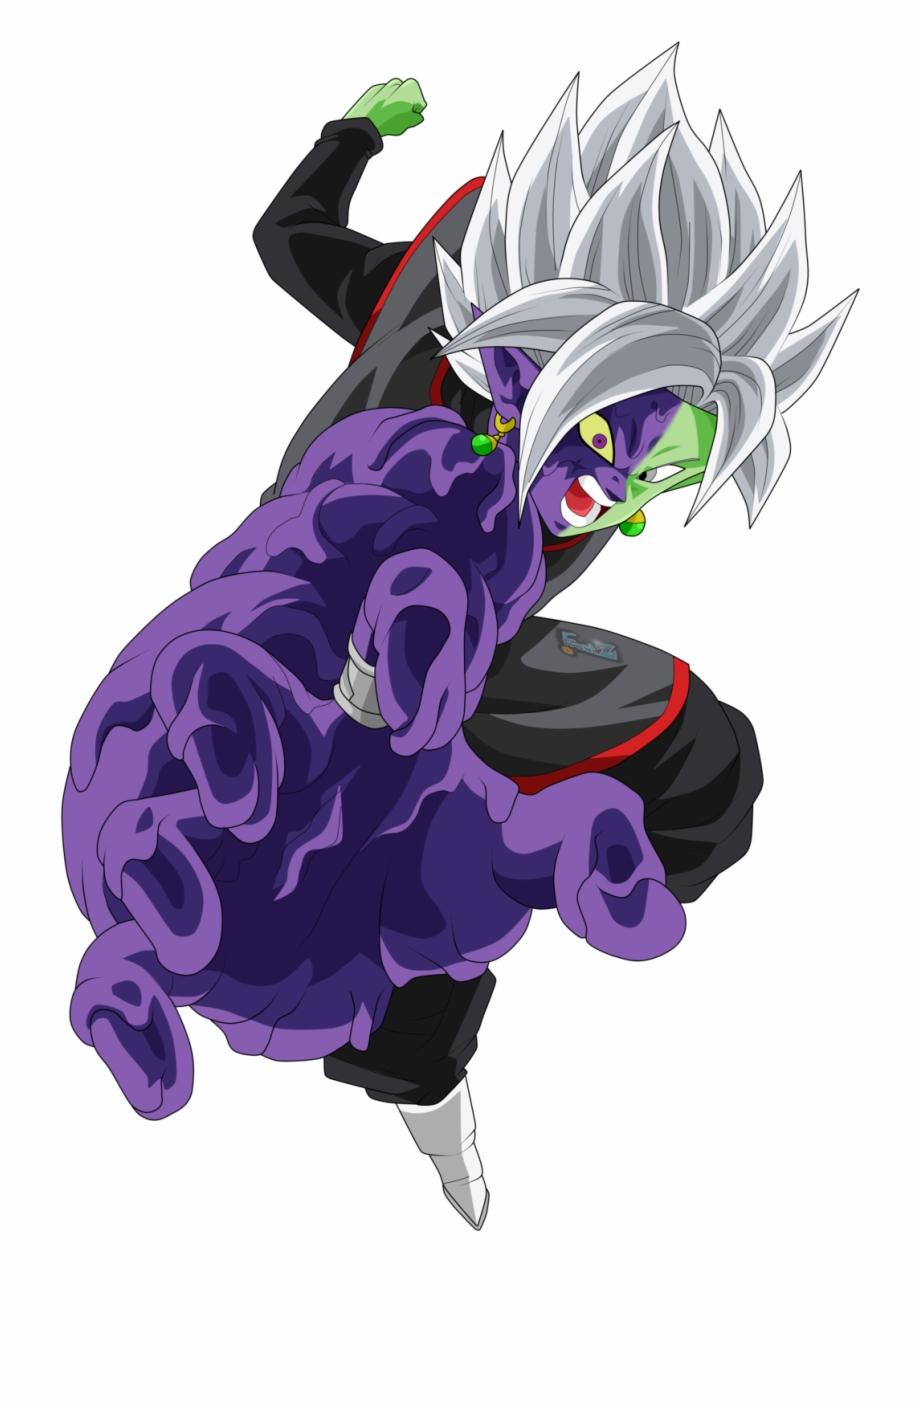 Deformed Fusion Zamasu.